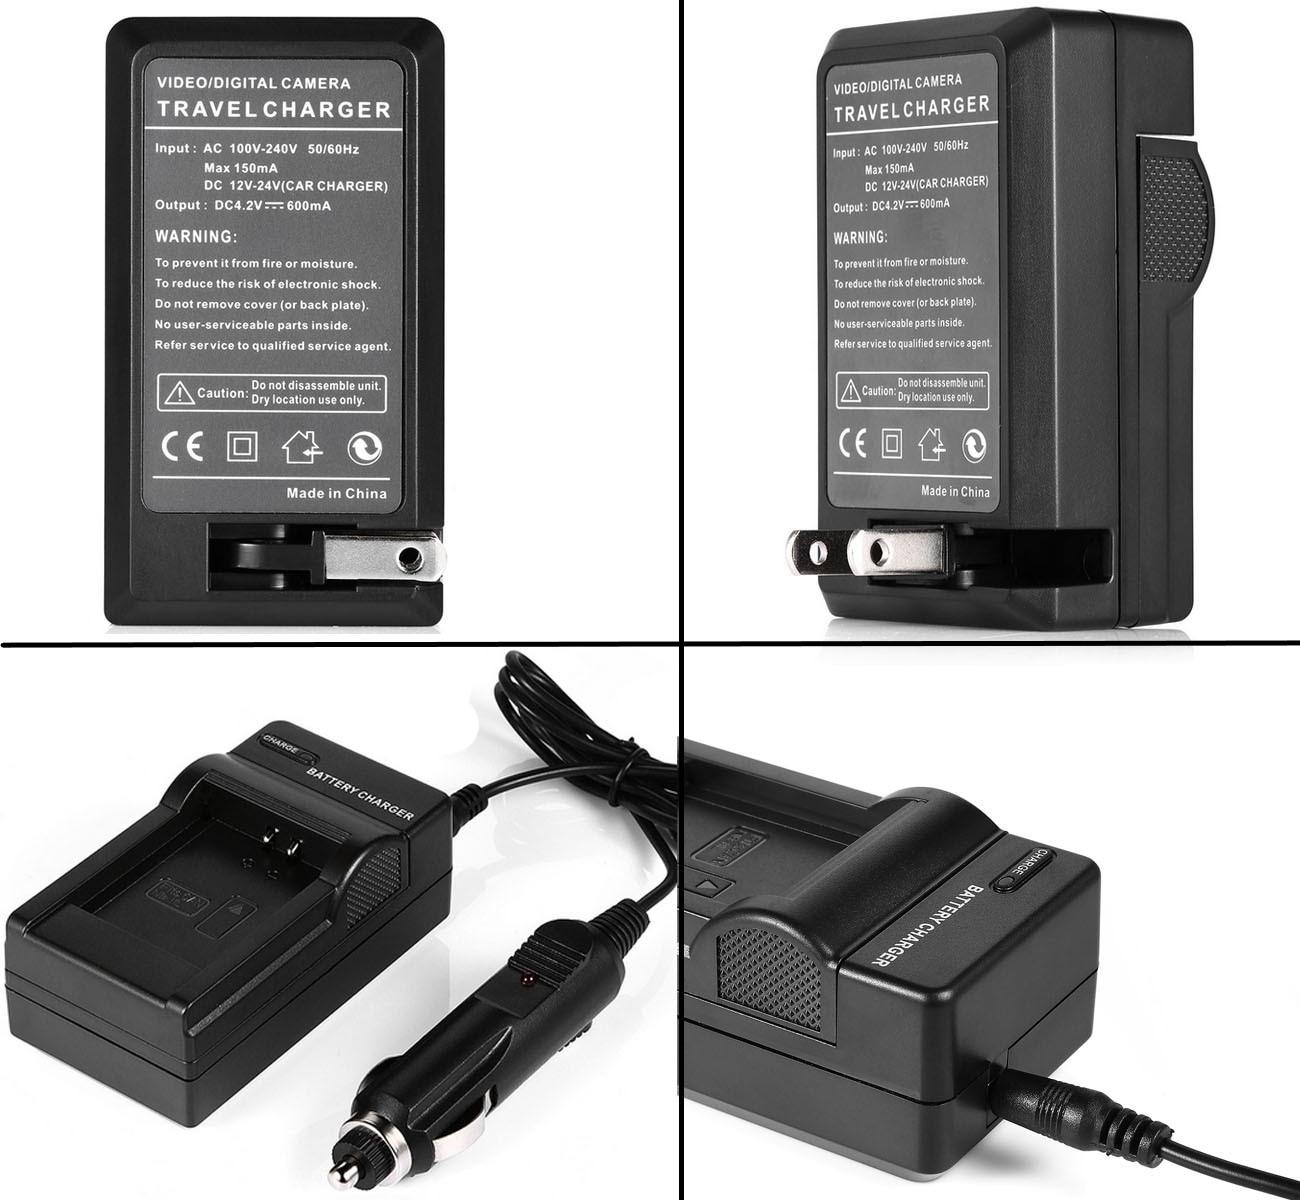 VHBW ® fotocamera CARICABATTERIE MICRO USB PER Sony Cybershot dsc-hx5//dsc-hx5v